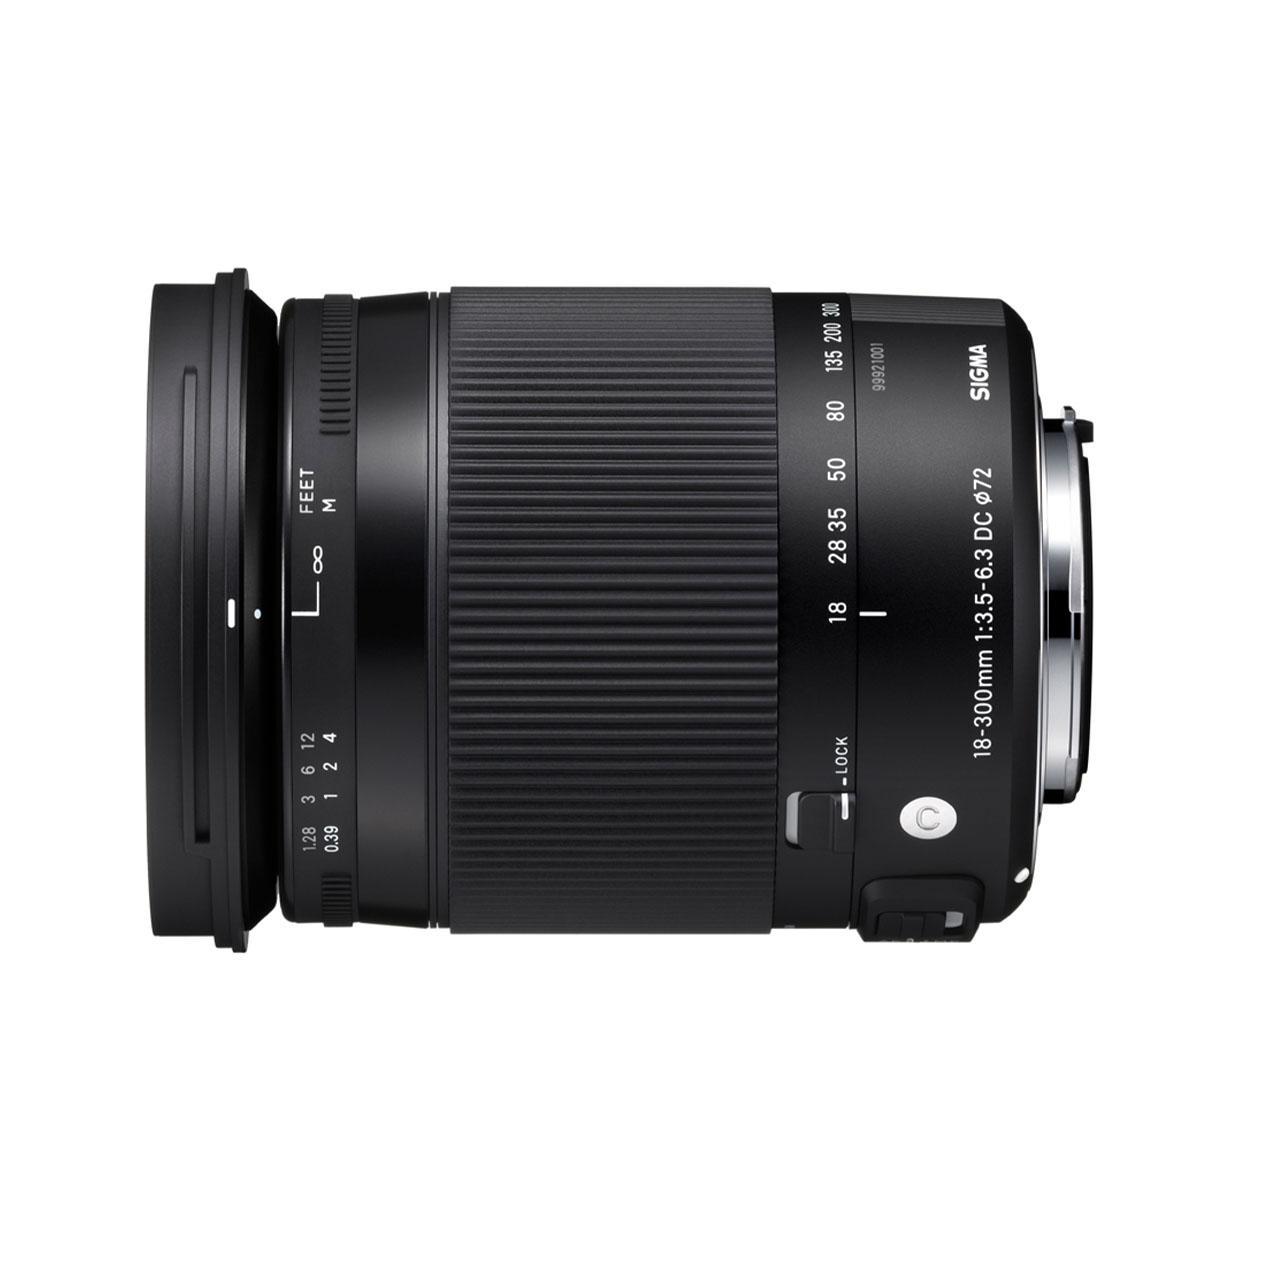 Sigma Nikon Objetivo 18-300mm f/3.5-6.3 DC OS Macro HSM Contemporary